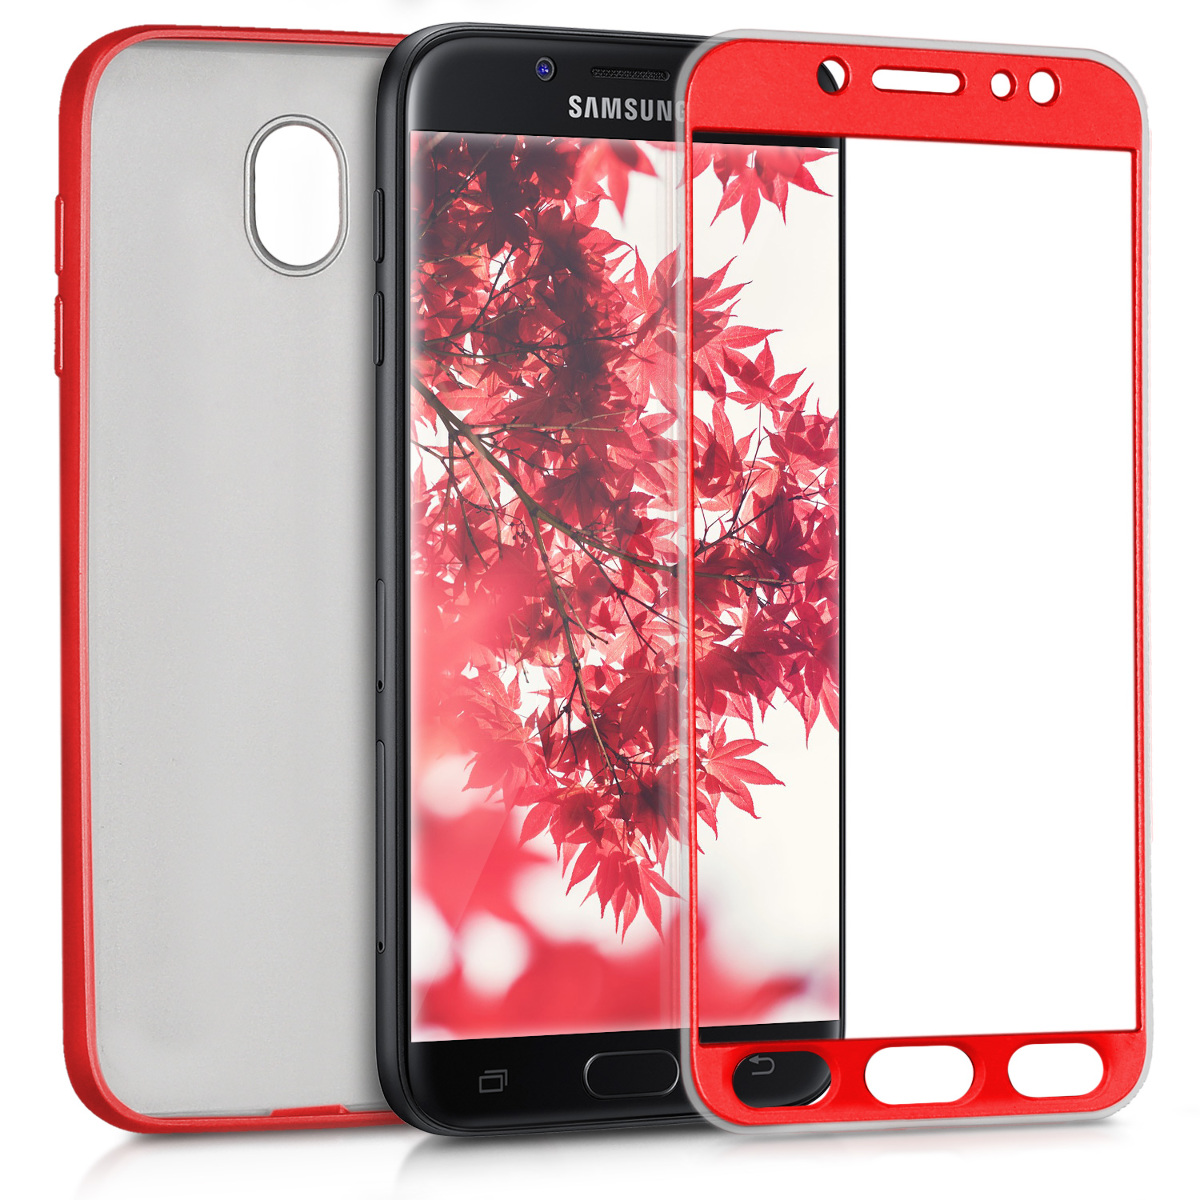 KW Θήκη Σιλικόνης Full Body Samsung Galaxy J5 2017 - Metallic Dark Red (42757.36)